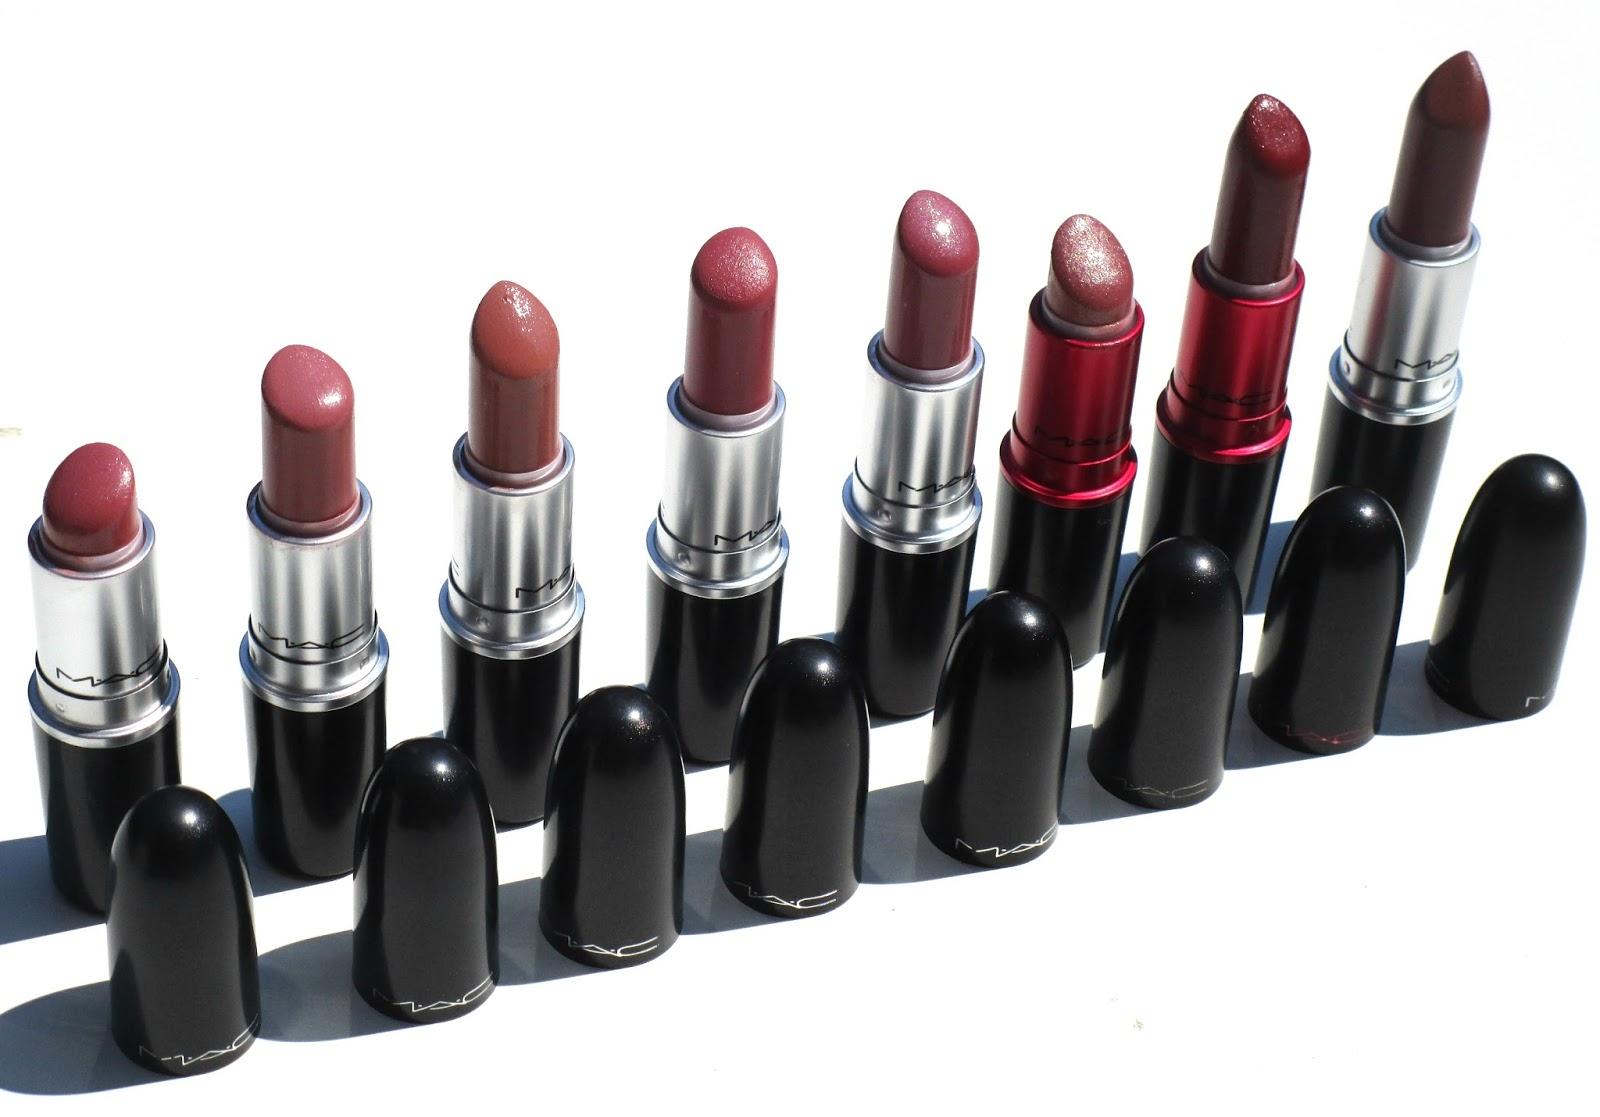 My MAC Lipstick Collection So Far.